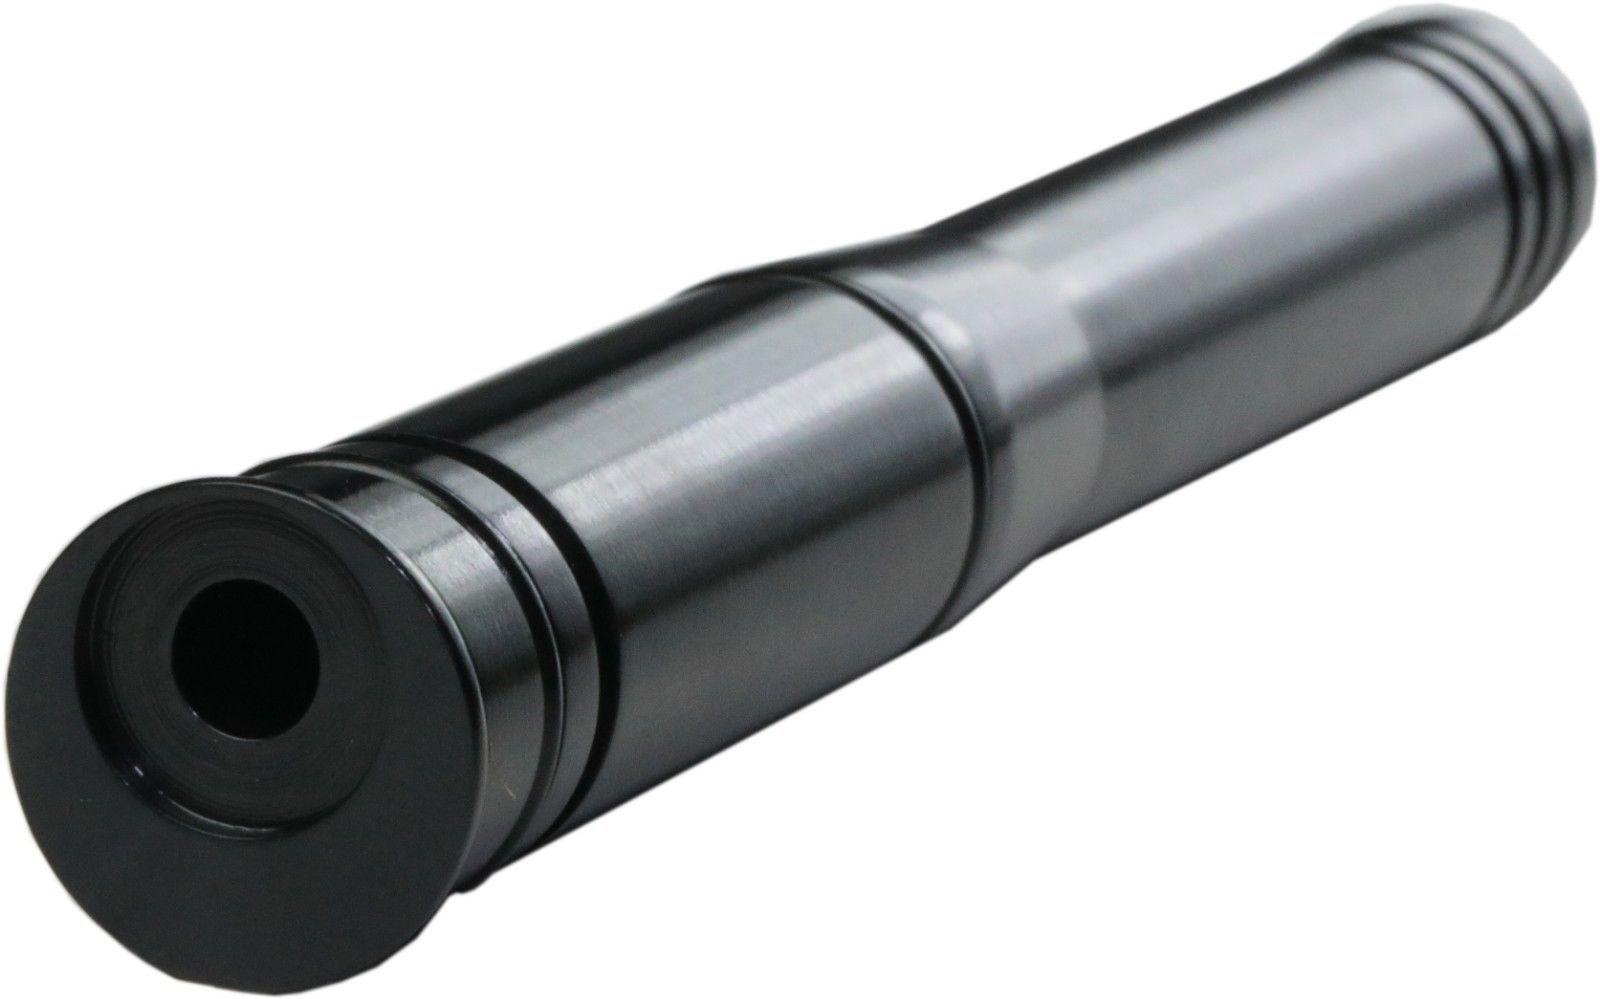 20 Gauge to 22 Long Rifle RIFLED Shotgun Adapter Long Black Oxide